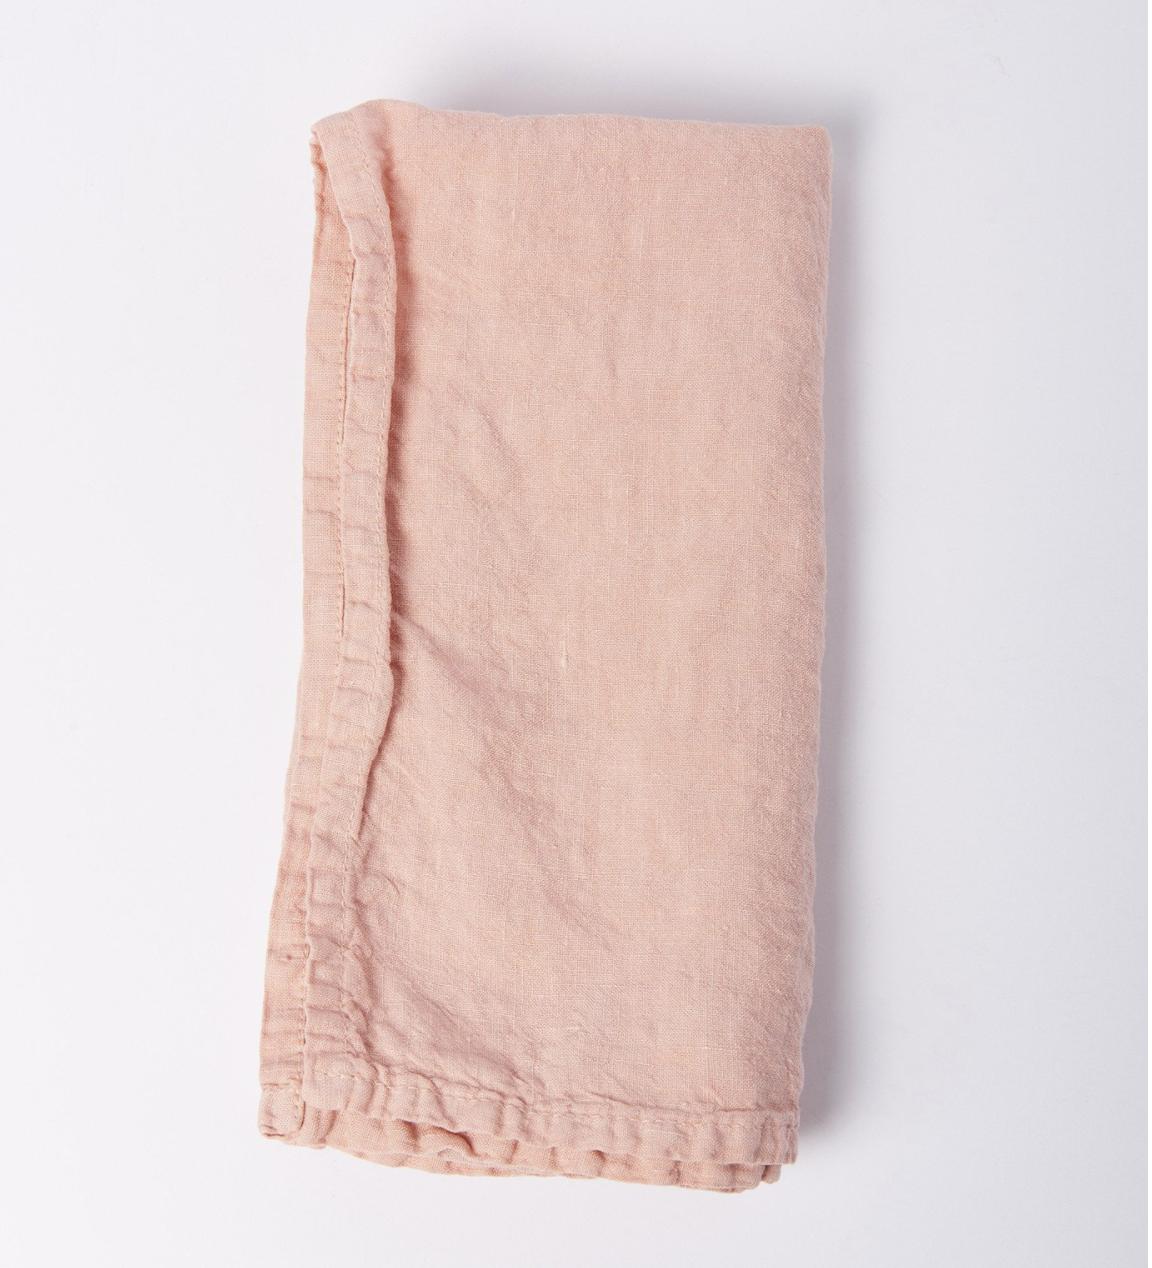 Hawkins NY Blush Simple Linen Napkin